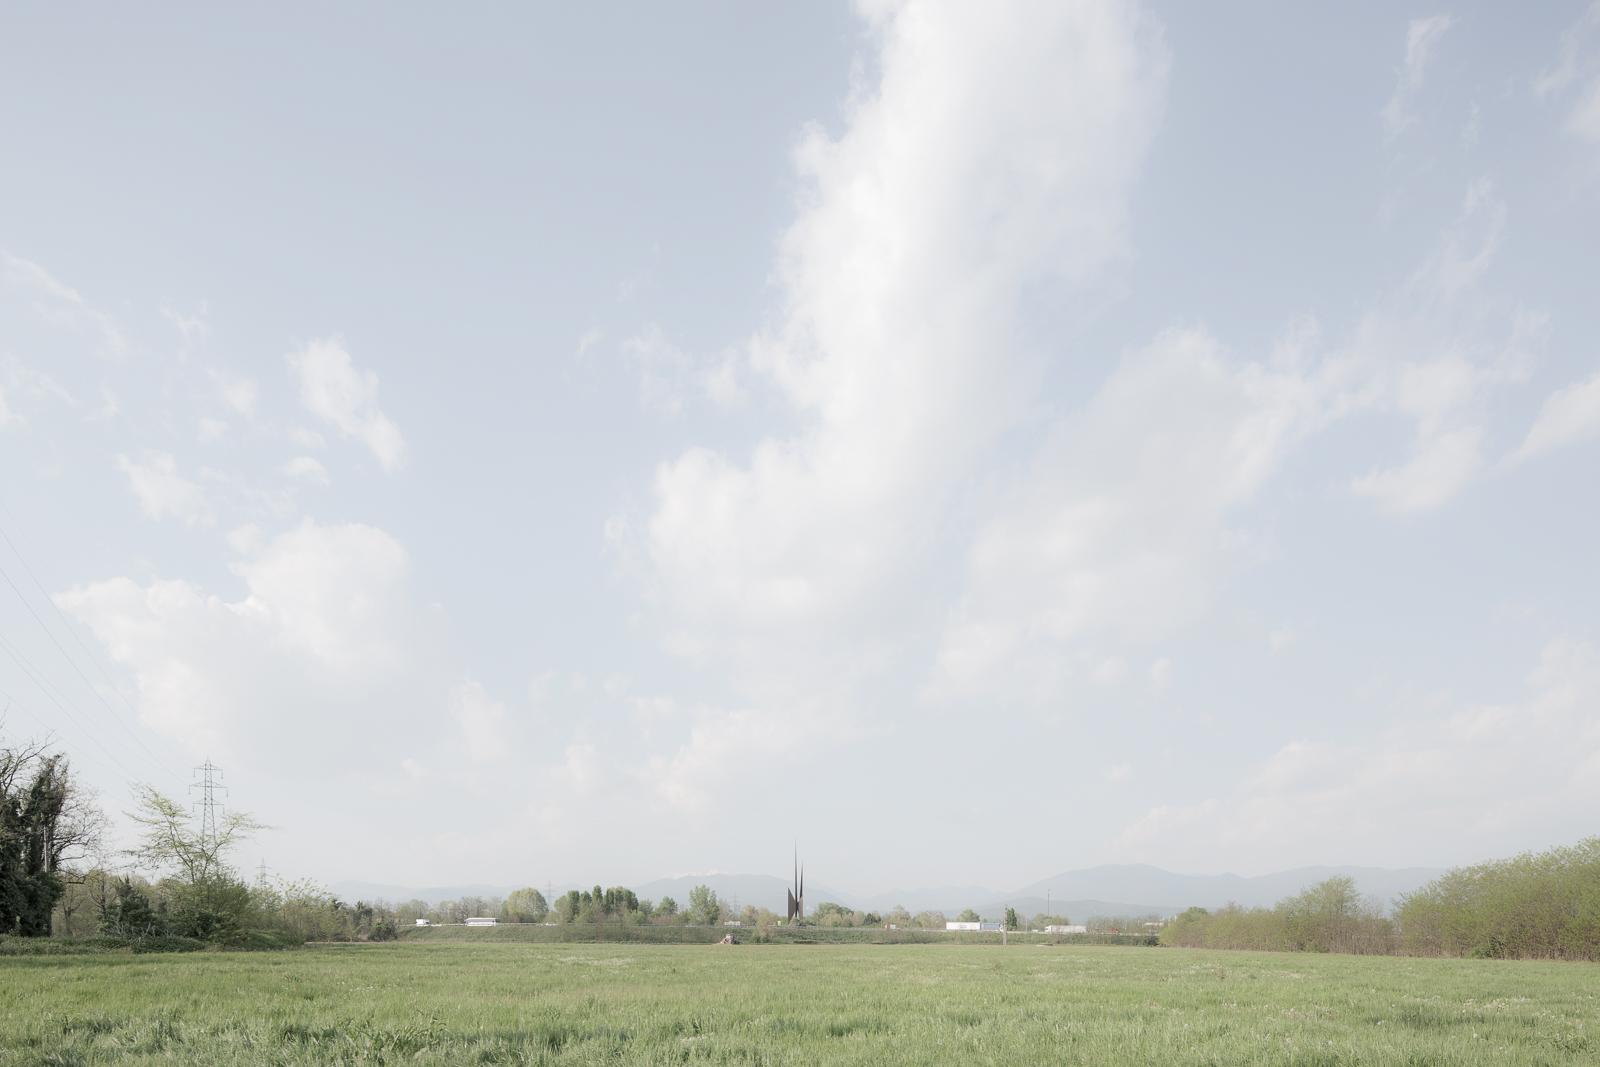 City Limits, 2014  Michele Gusmeri